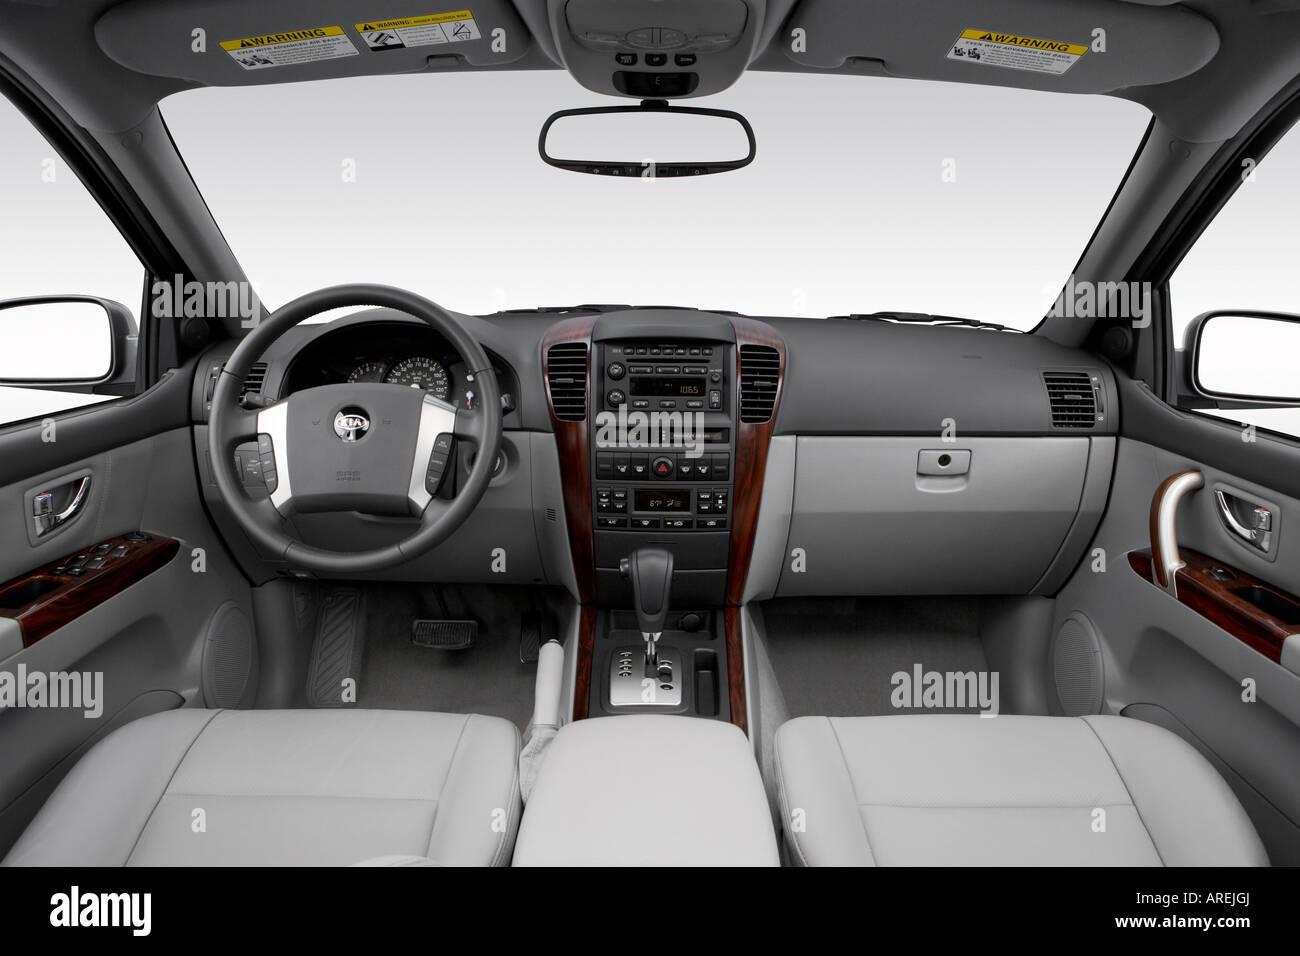 2006 kia sorento ex in gray dashboard center console gear shifter view